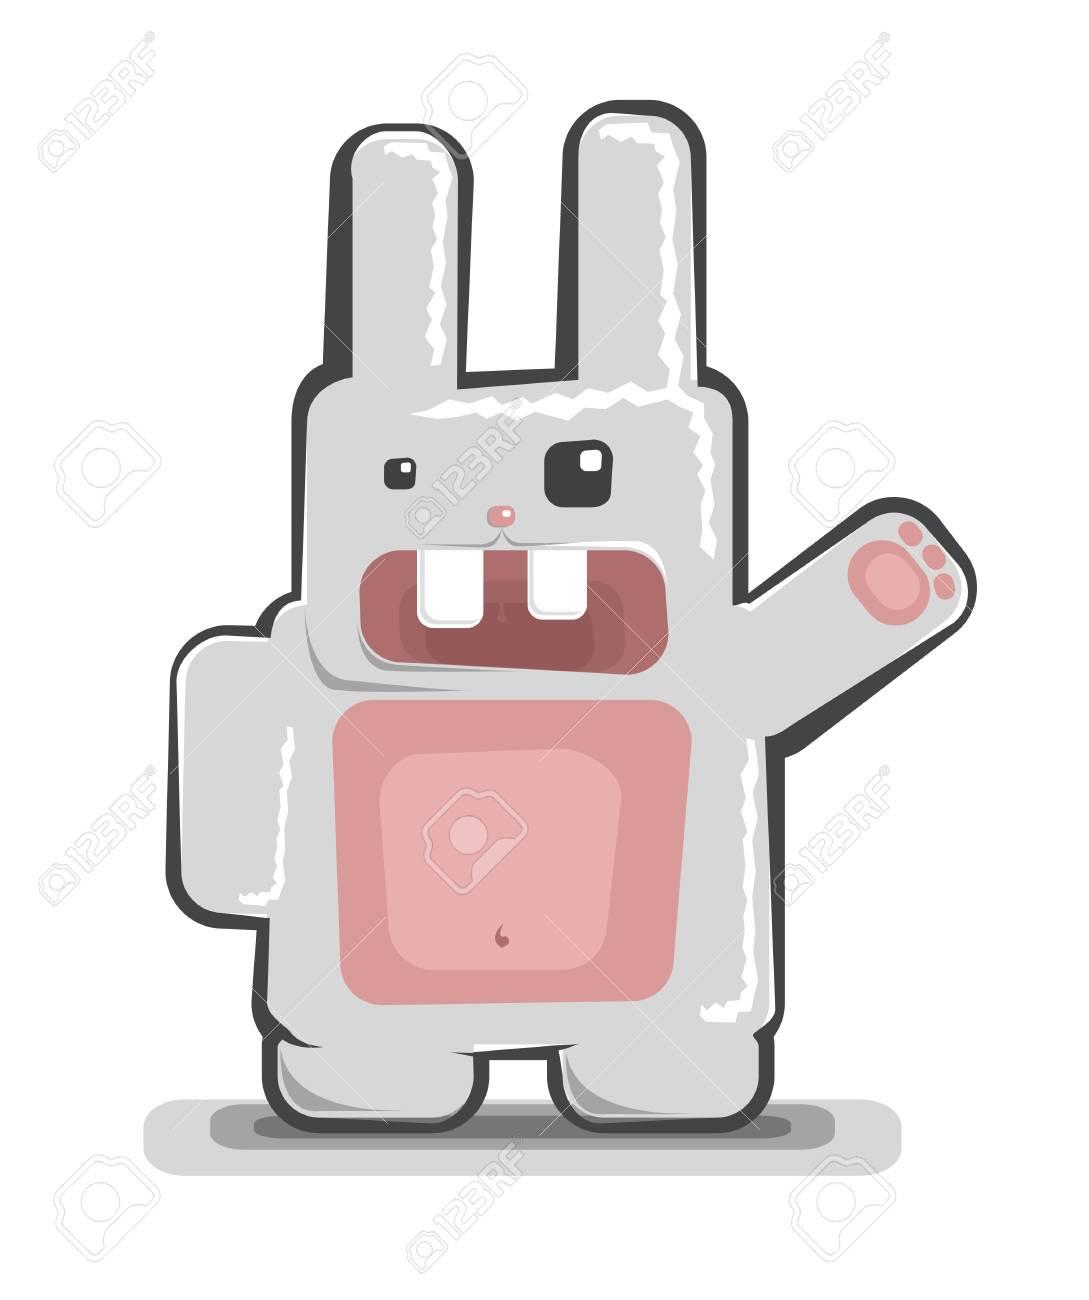 funny white rabbit Stock Vector - 7833905